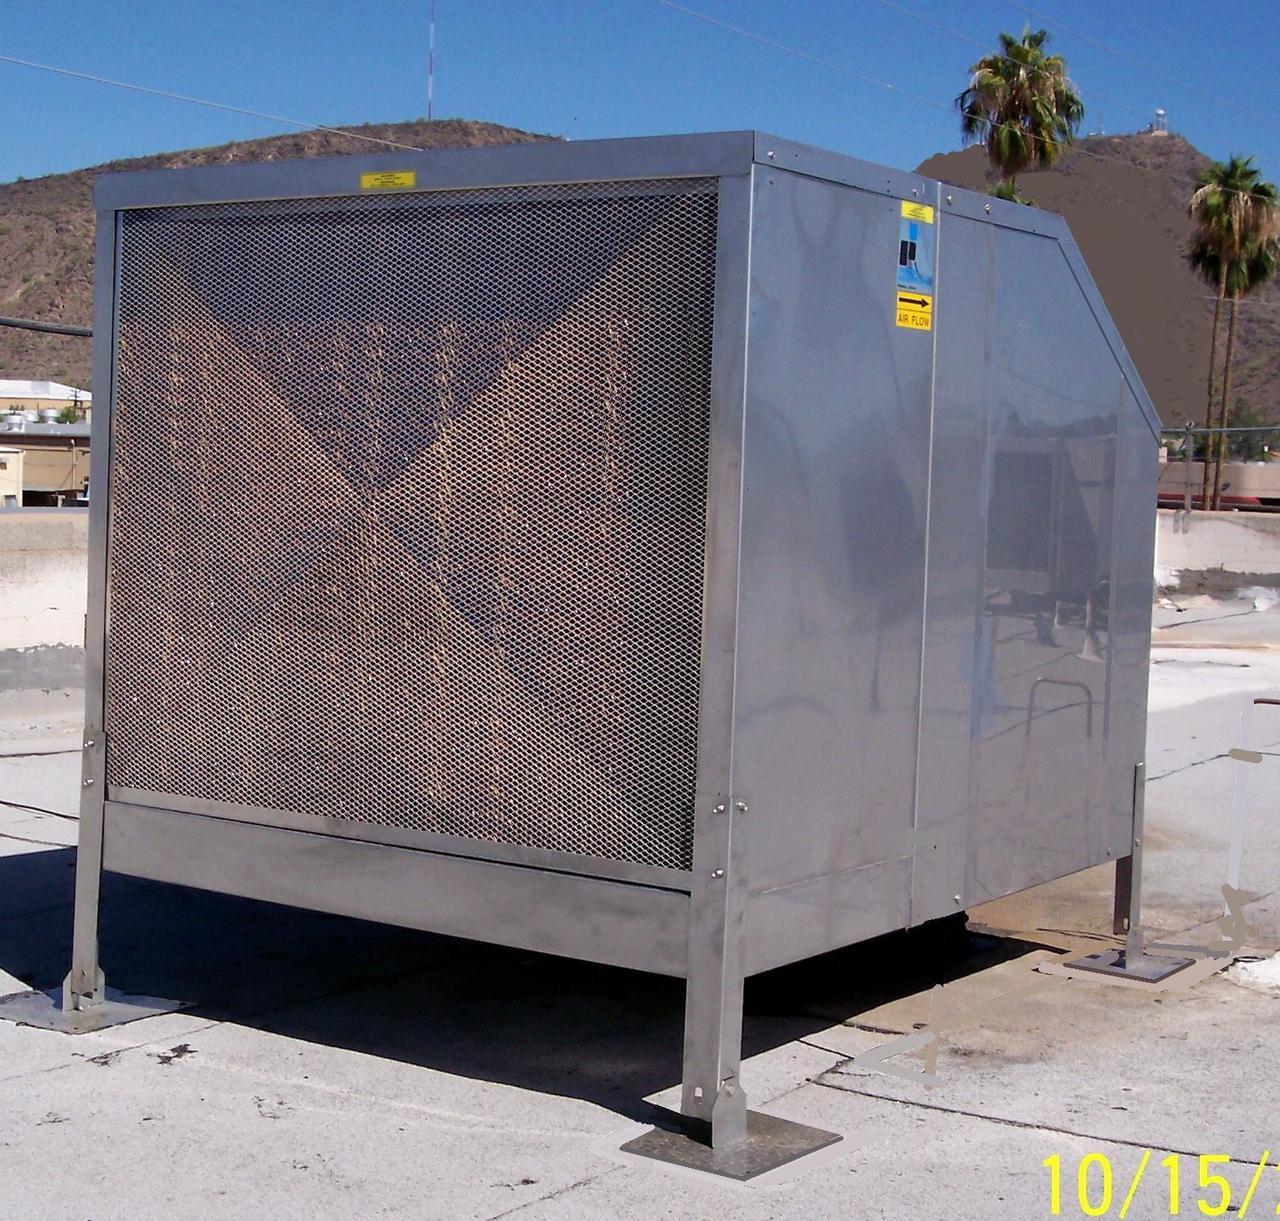 Stainless Steel Evaporative Cooler 6000 Cfm Premiercool